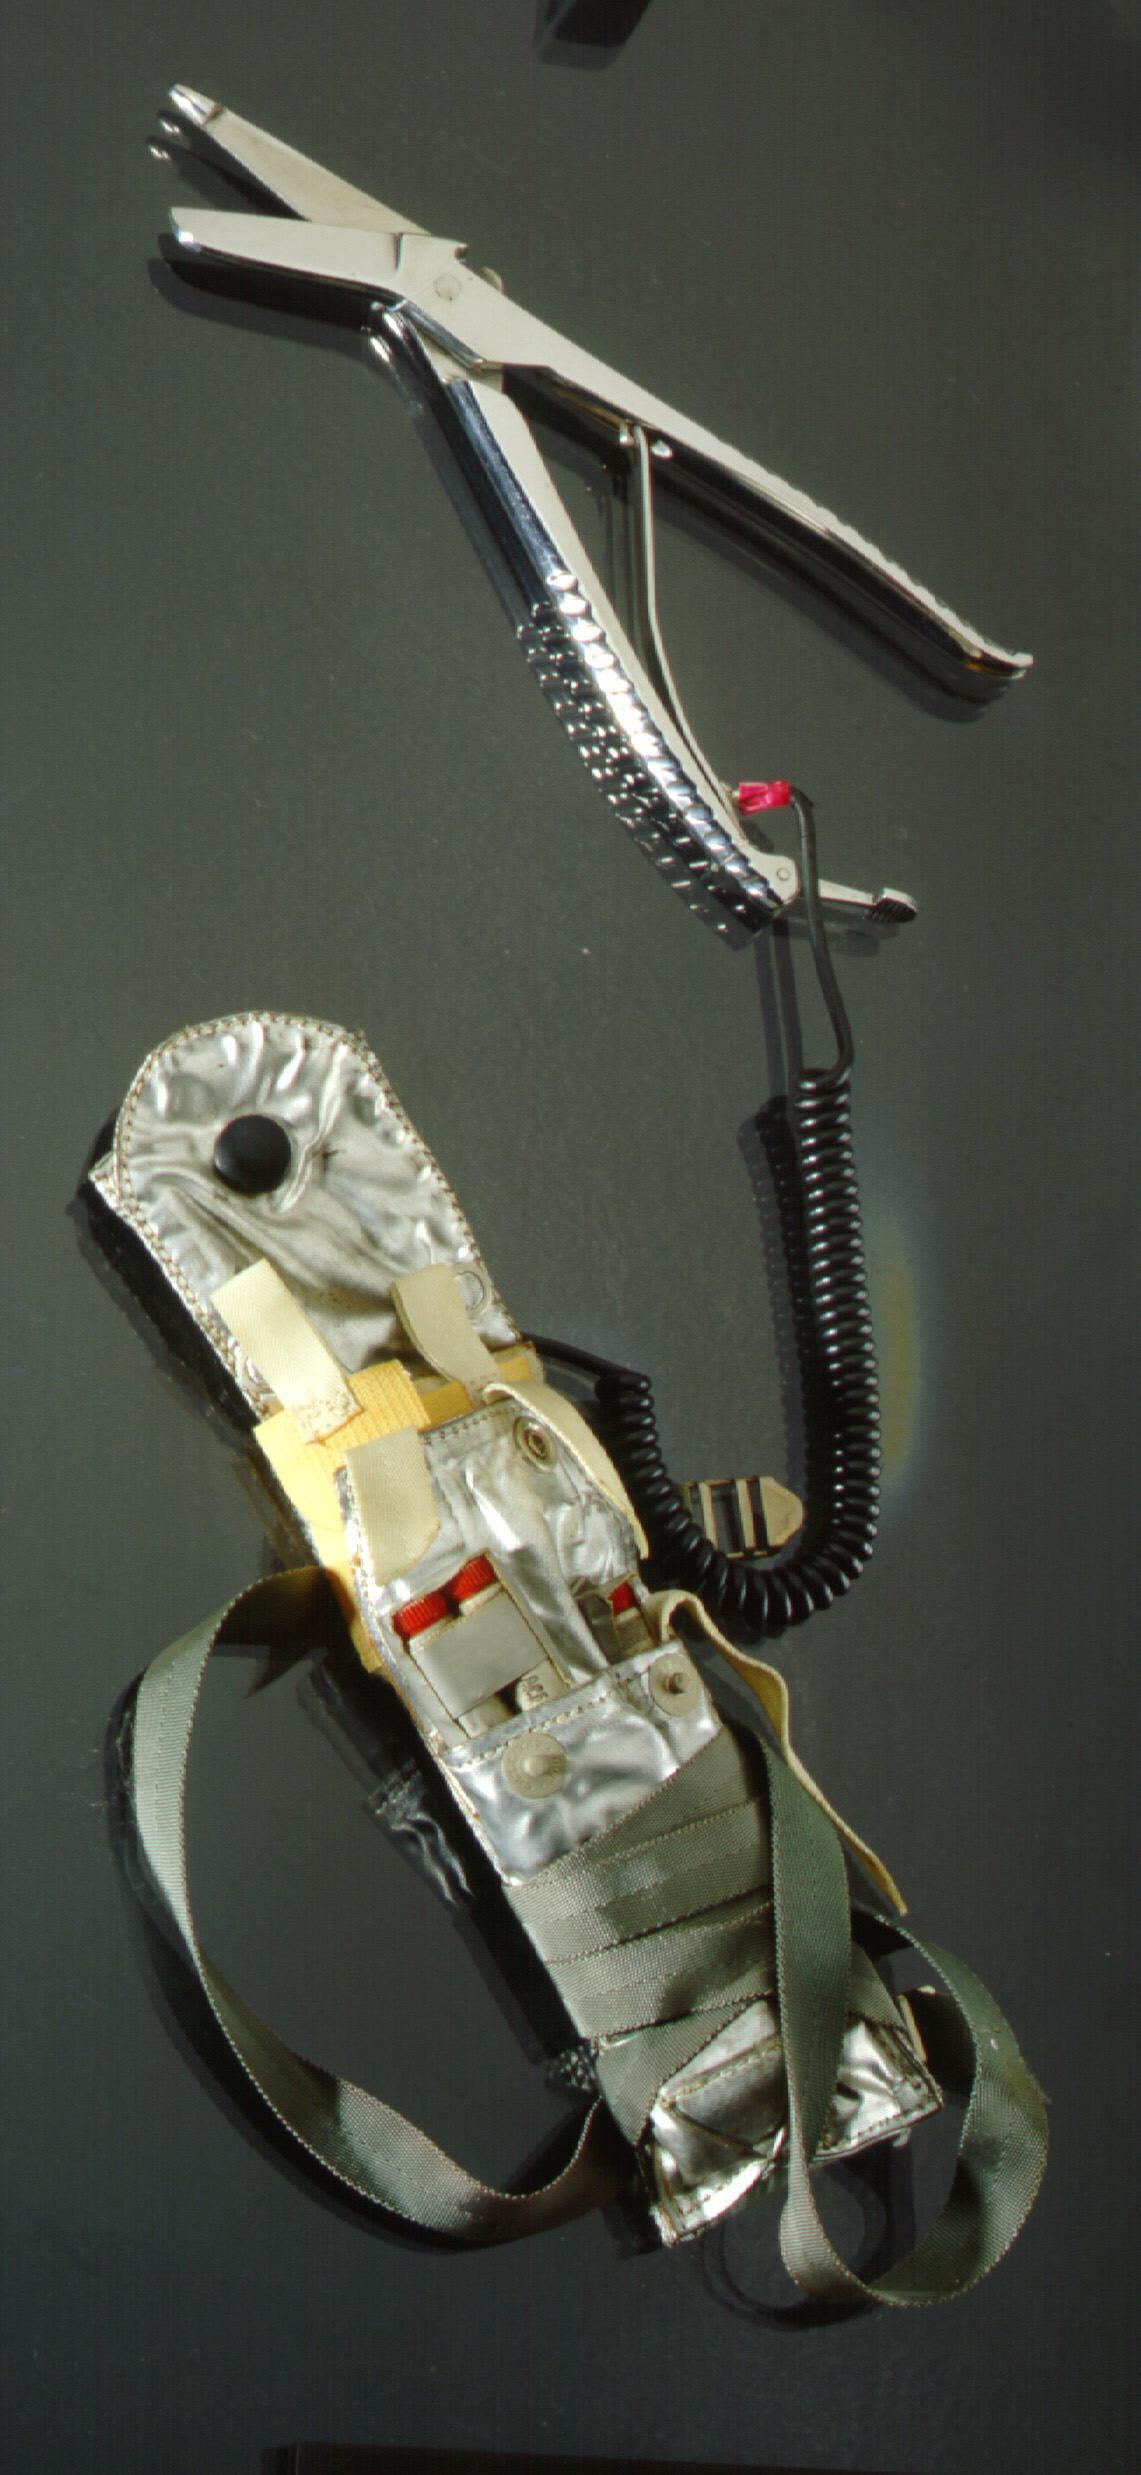 Image of : Kit, First Aid, Mercury, Glenn, Friendship 7